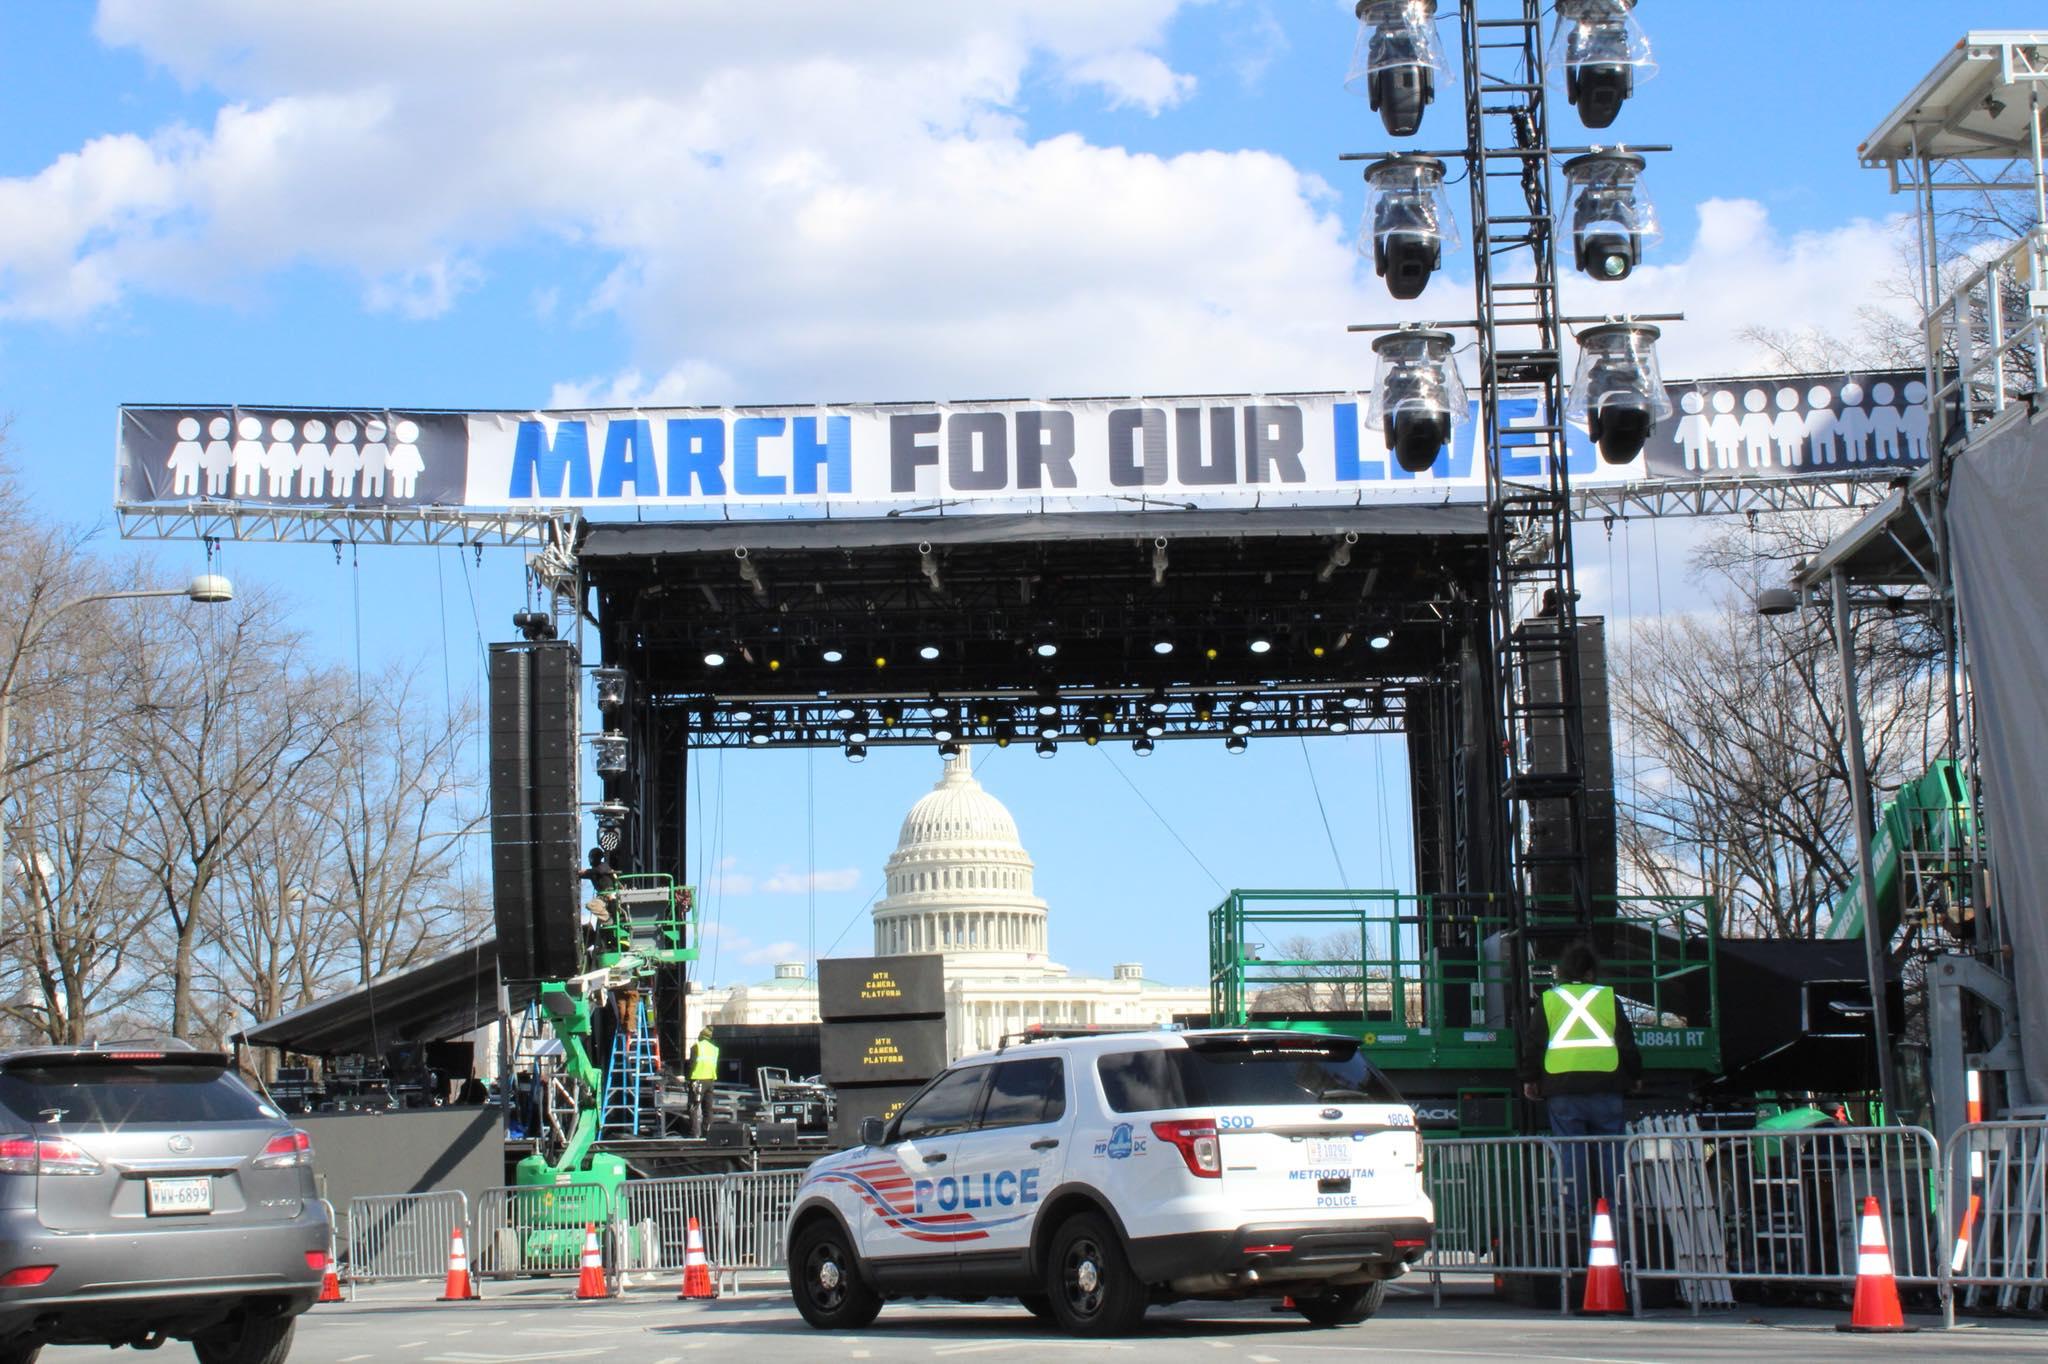 <div class='meta'><div class='origin-logo' data-origin='WTVD'></div><span class='caption-text' data-credit='DeJuan Hoggard'>March for Our Lives in Washington D.C.</span></div>